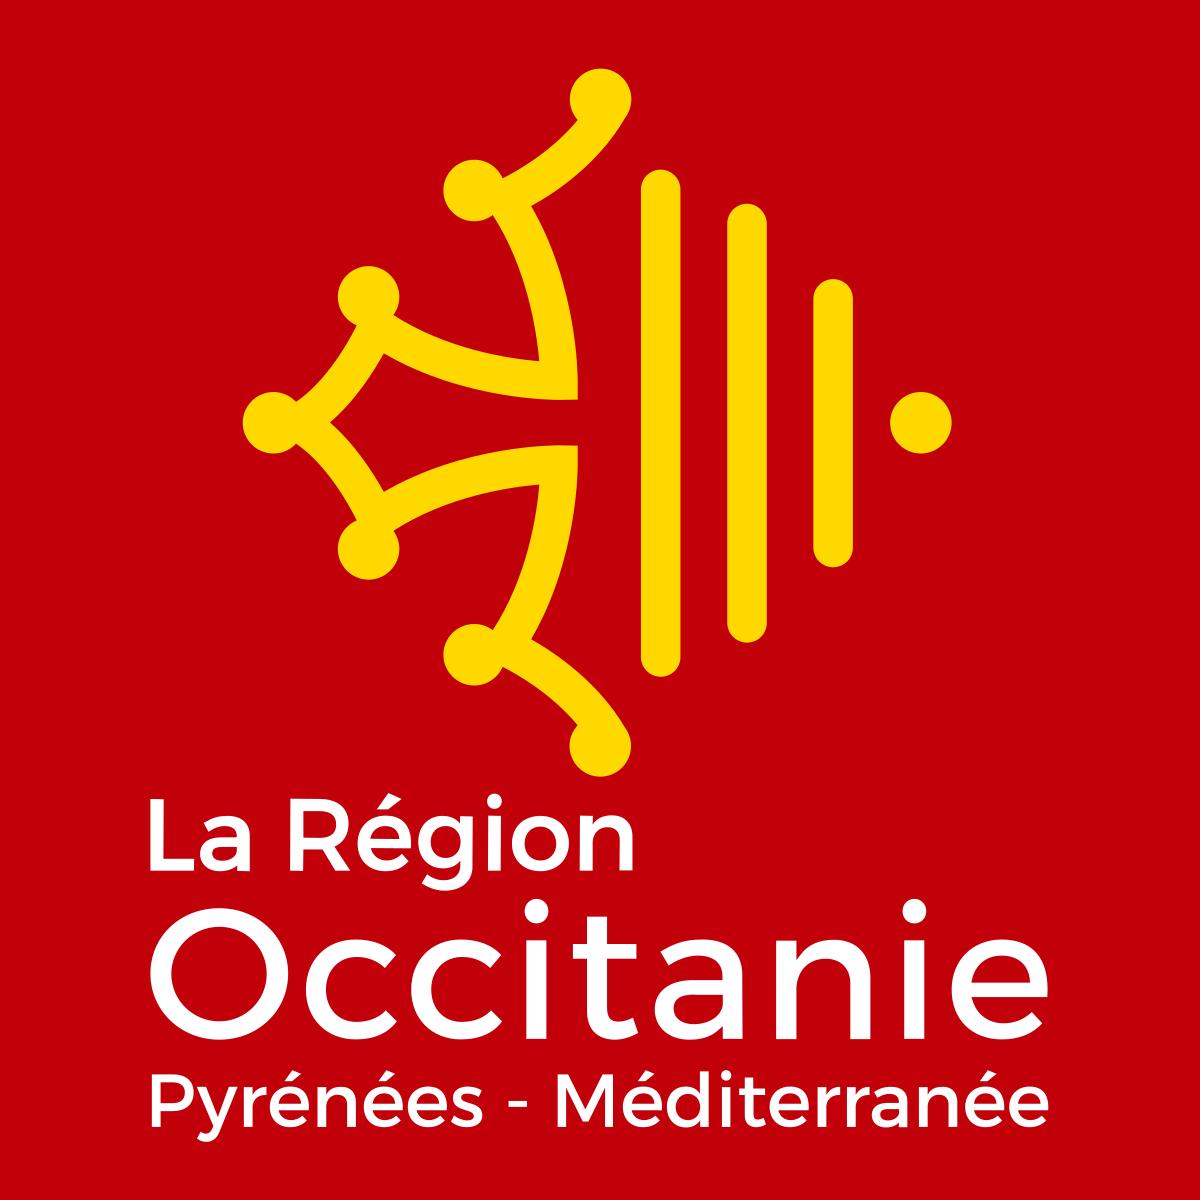 1200px-logo_occitanie_2017.svg_.png